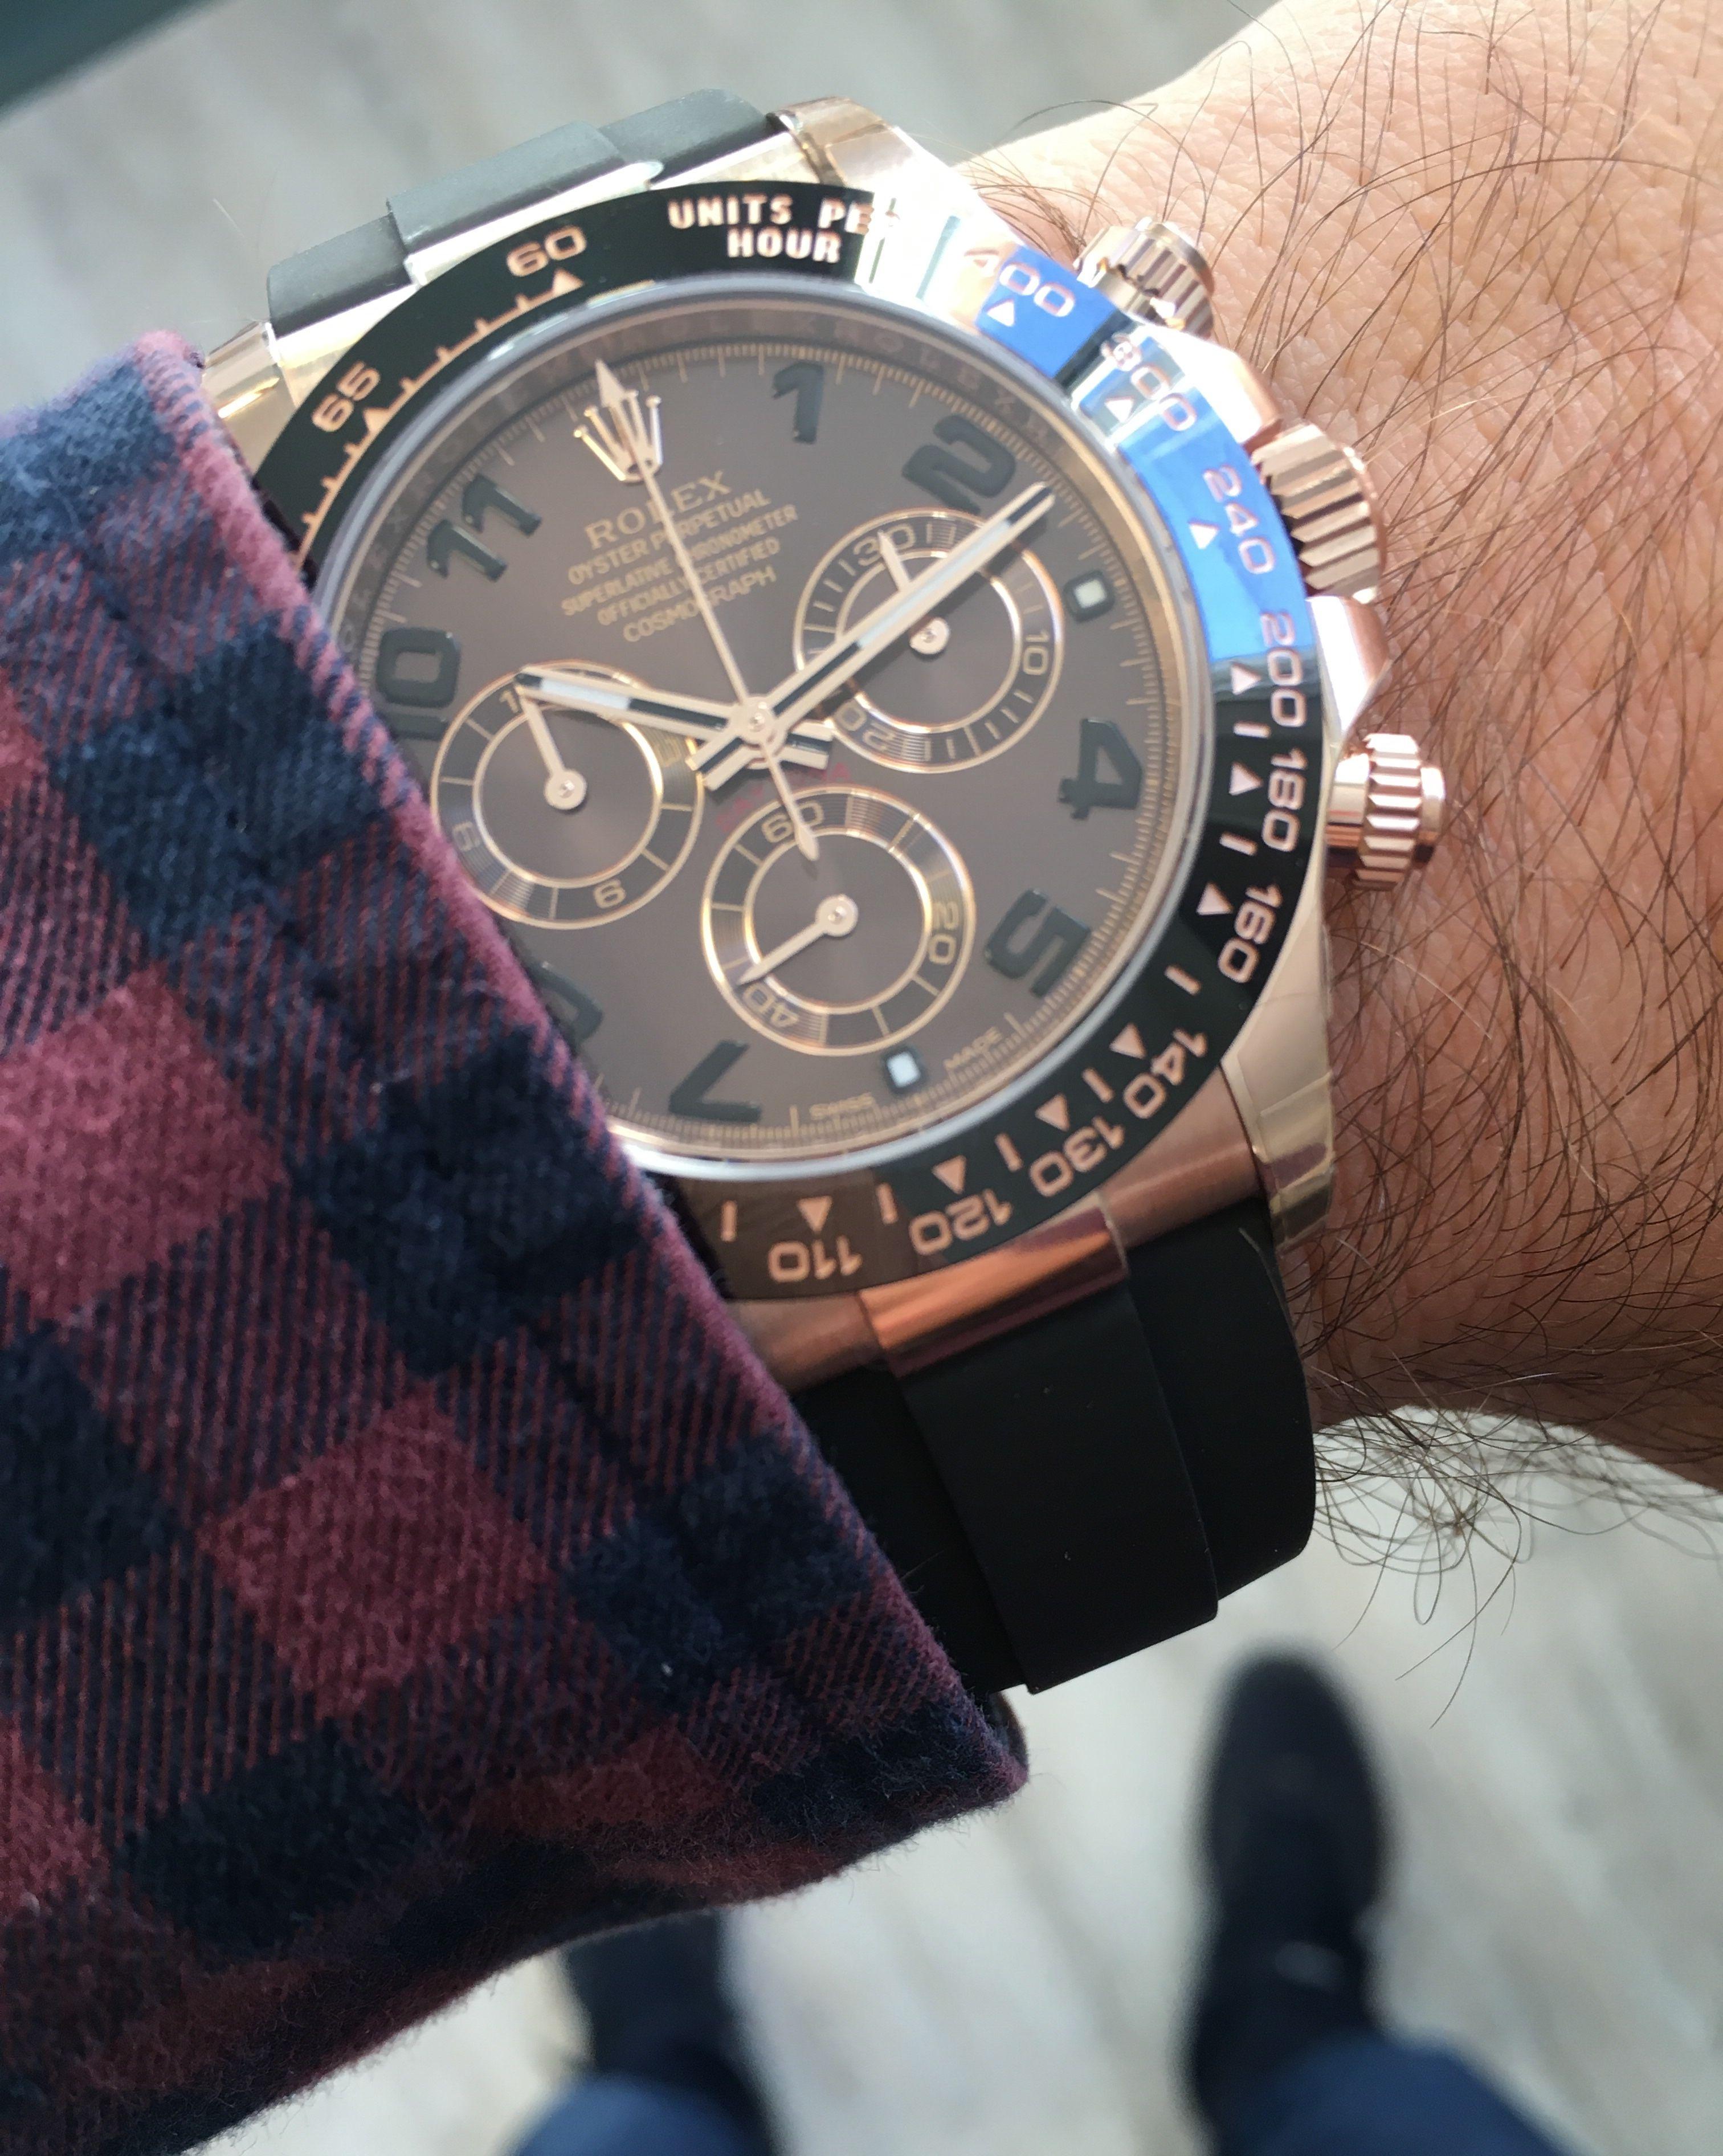 Rolex Daytona Rose Gold Chocolate Dial Oysterflex 116515ln Watches